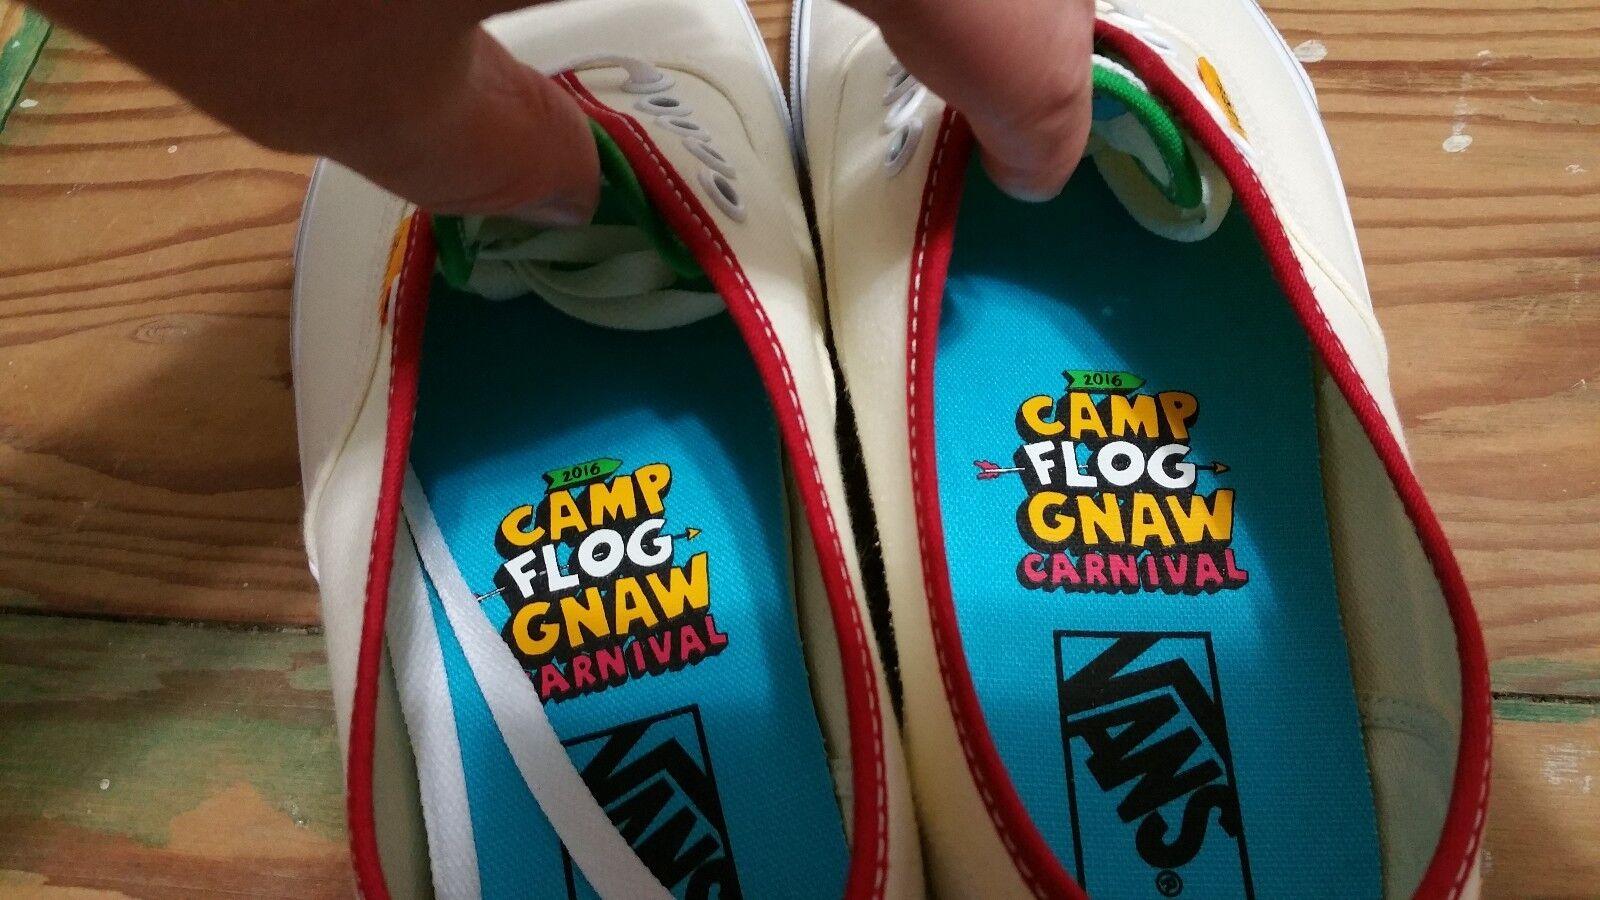 421ef70bad7c58 ... Vans X CFG CFG CFG Camp Flog Gnaw Festival Authentic Size 9 golf wang  supreme wtaps ...